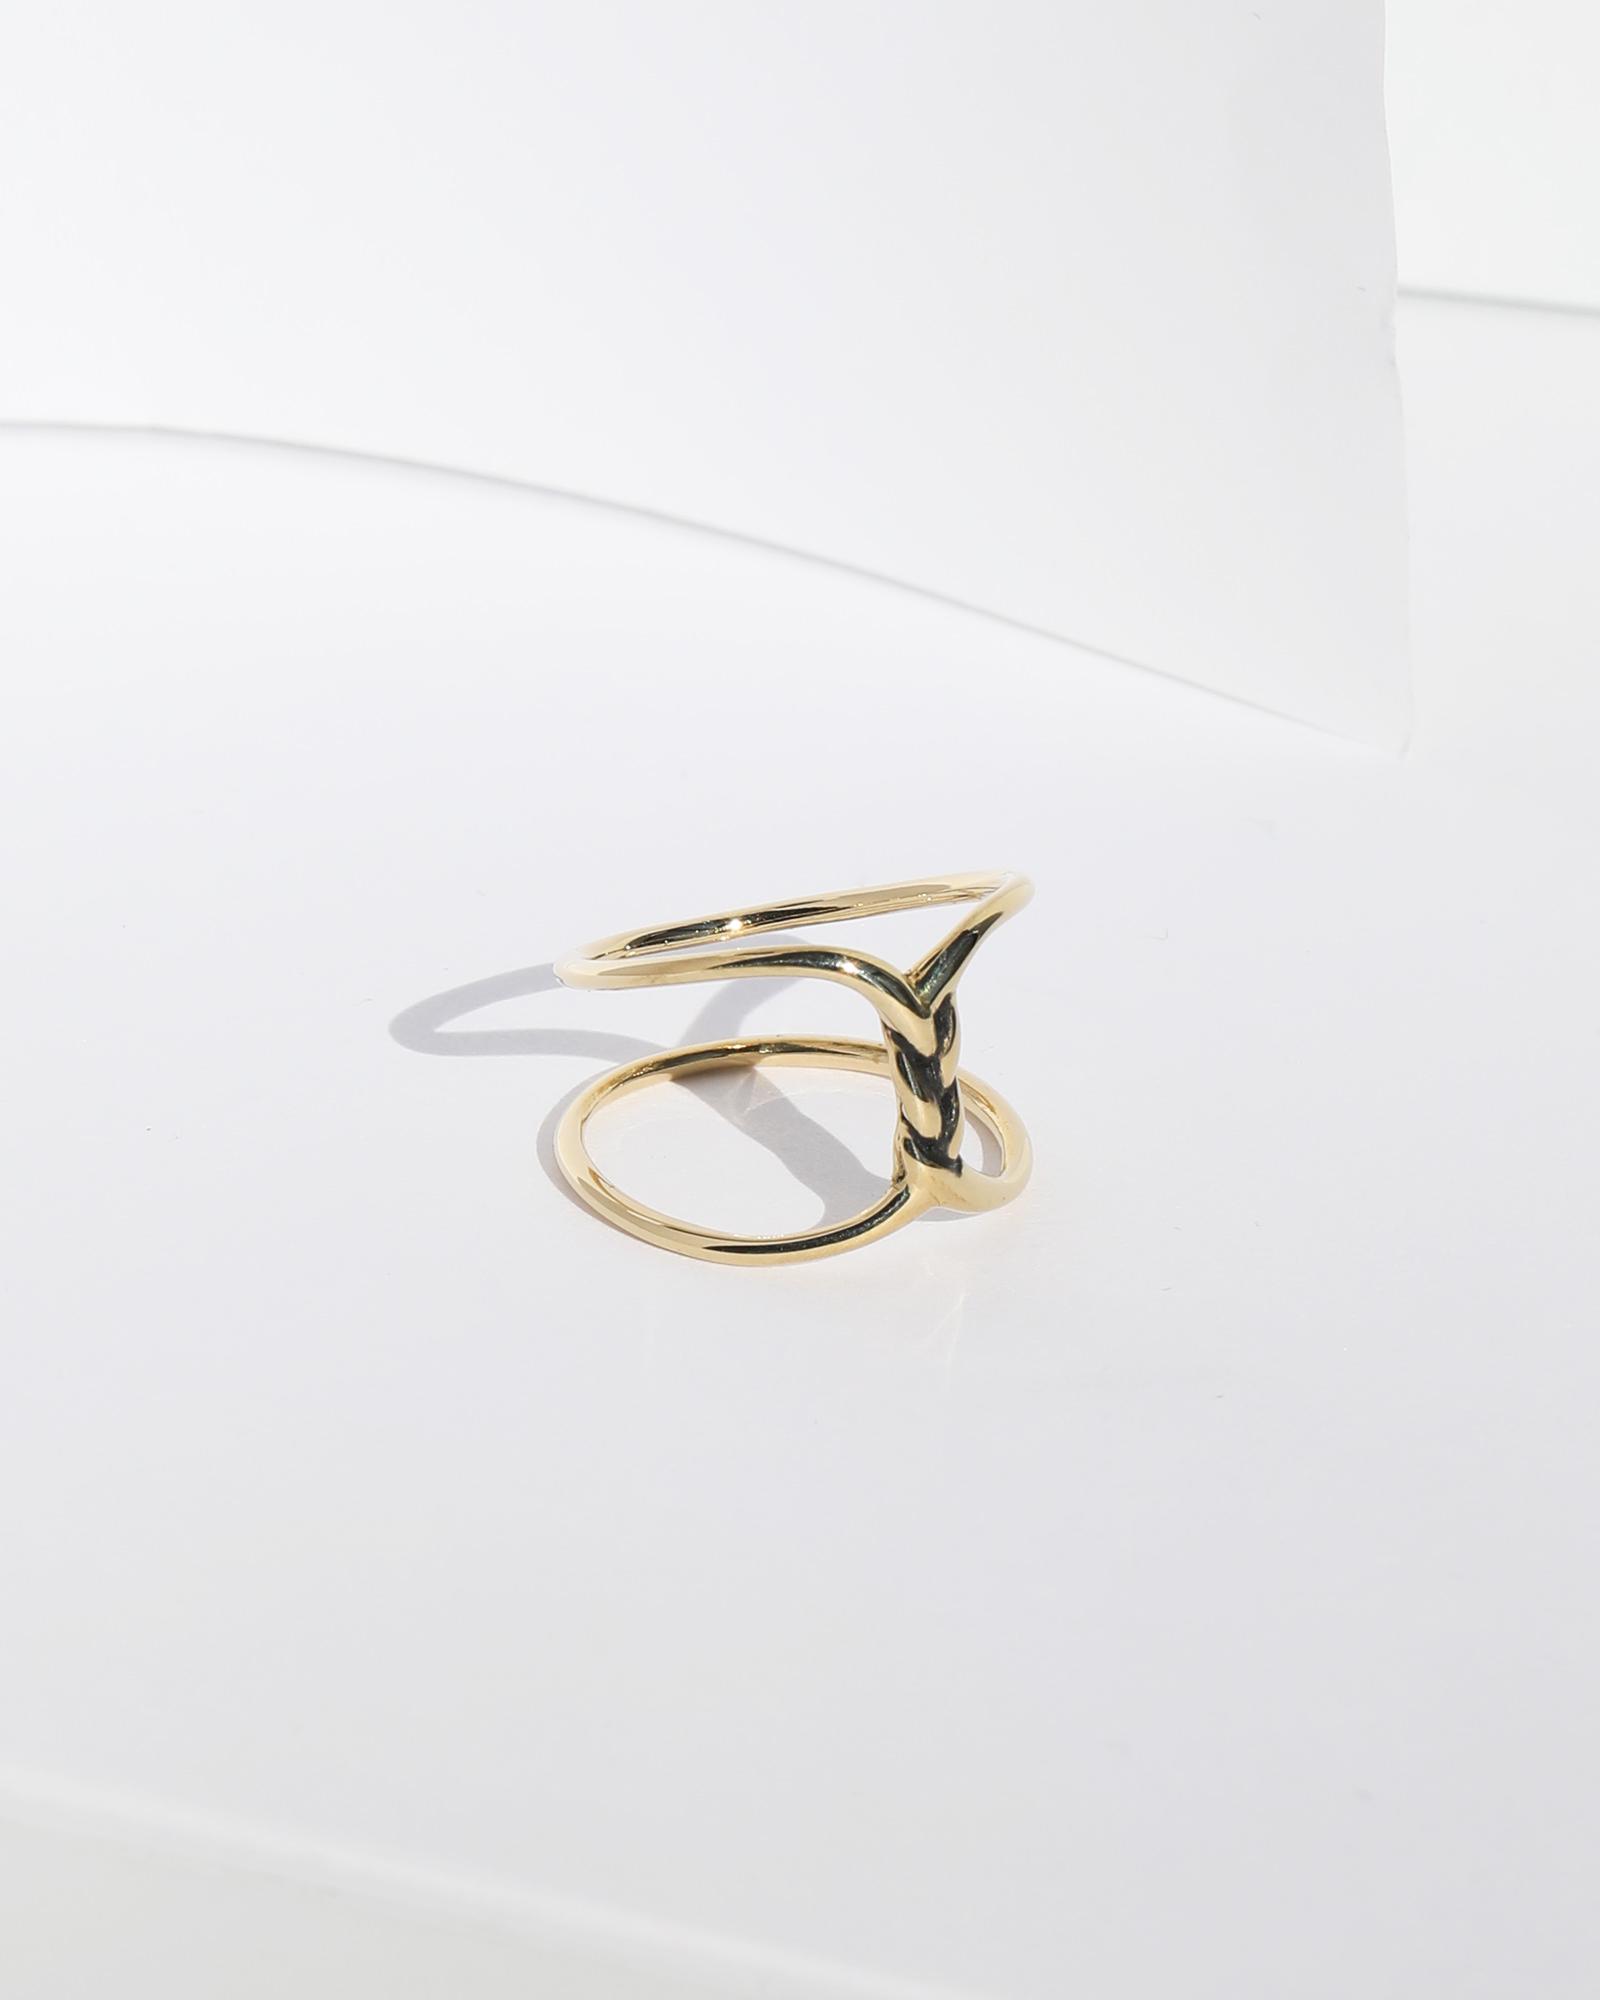 ring_dbl_braid_bronze_1.jpg